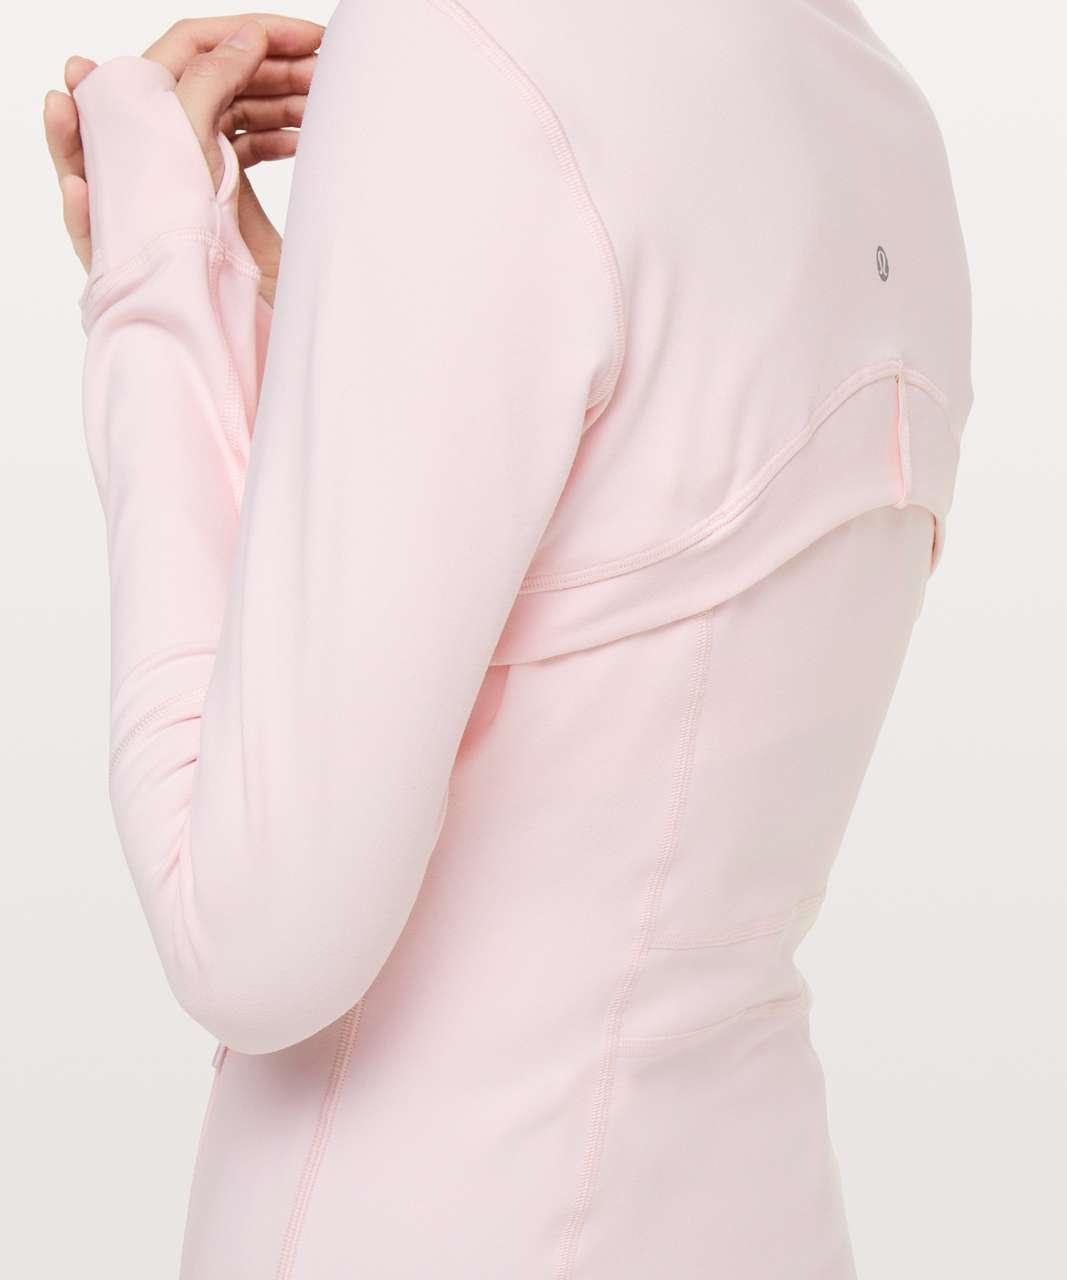 Lululemon Define Jacket - Blissful Pink